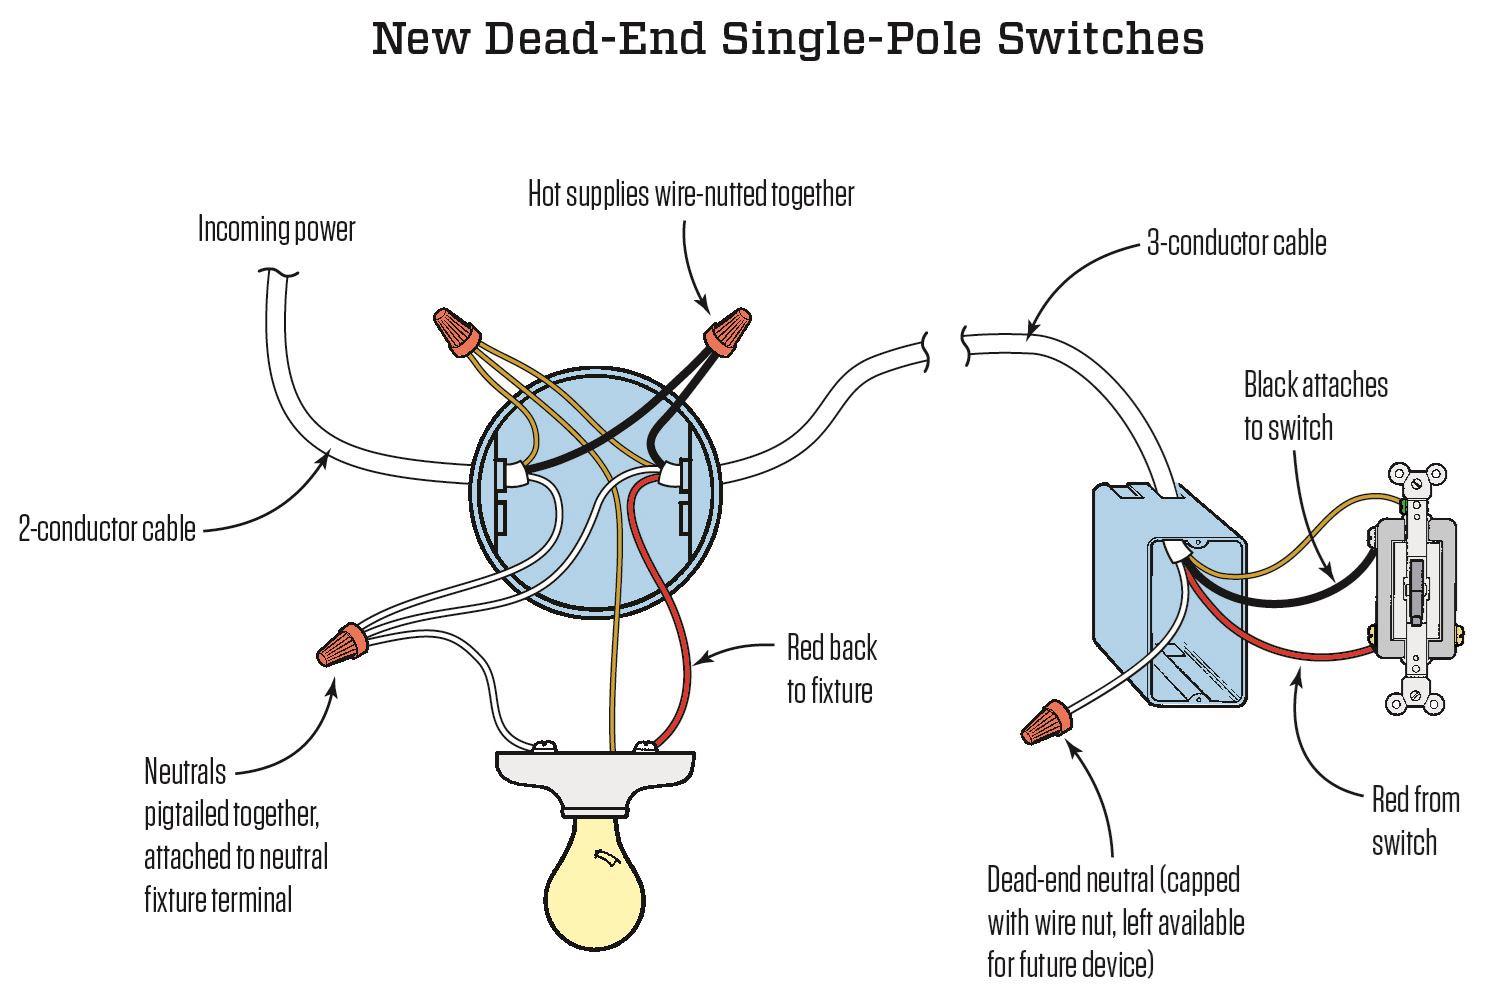 Single Pole 3 Way Switch Wiring Diagram | Wiring Diagram - 3 Way Switch Single Pole Wiring Diagram